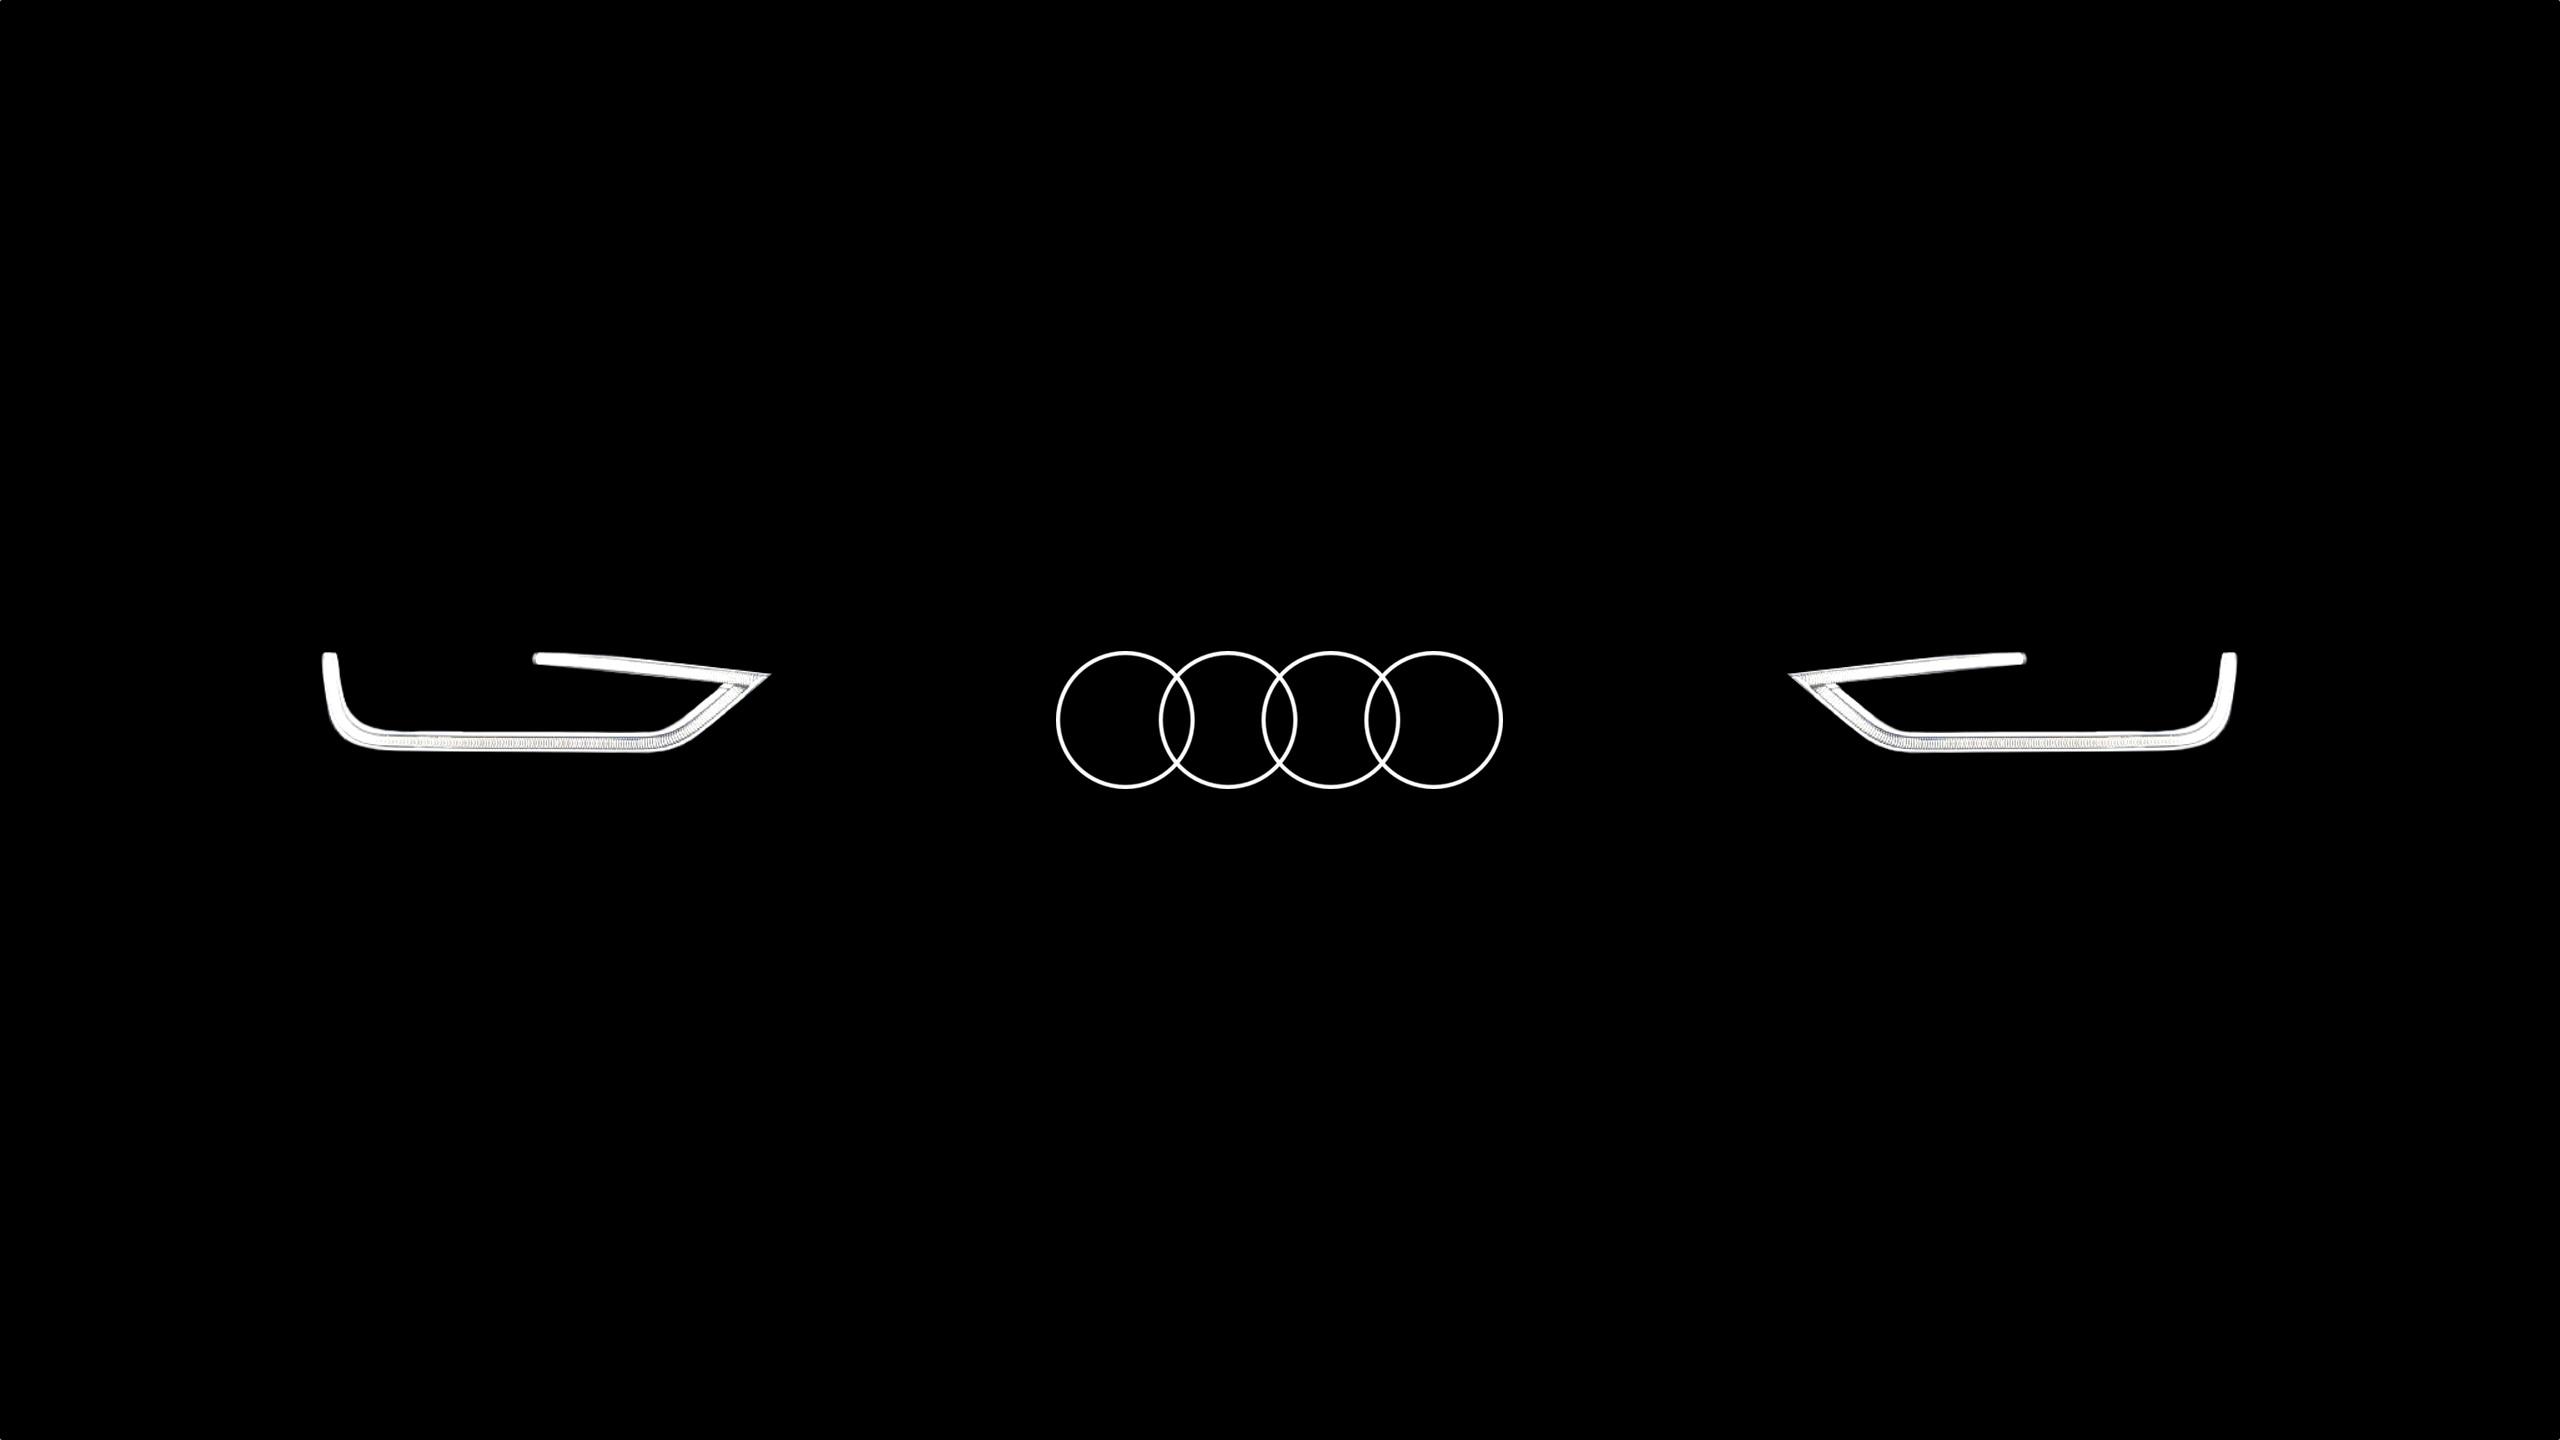 Audi Hd Wallpaper Background Image 2560x1440 Id 771190